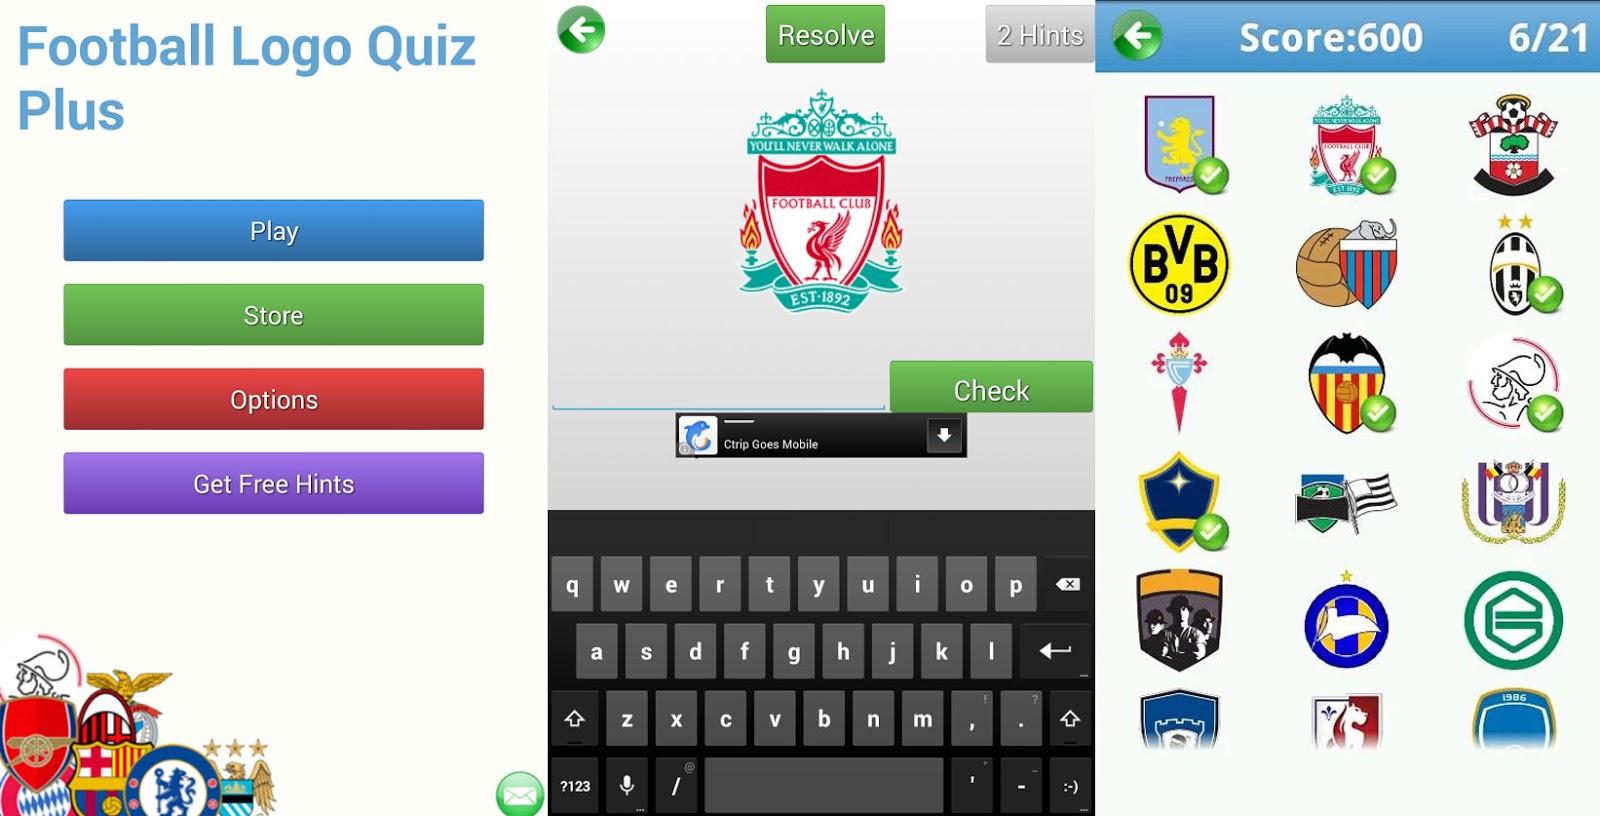 Amato Football Logo Quiz Plus Answers ~ Doors Geek EE32